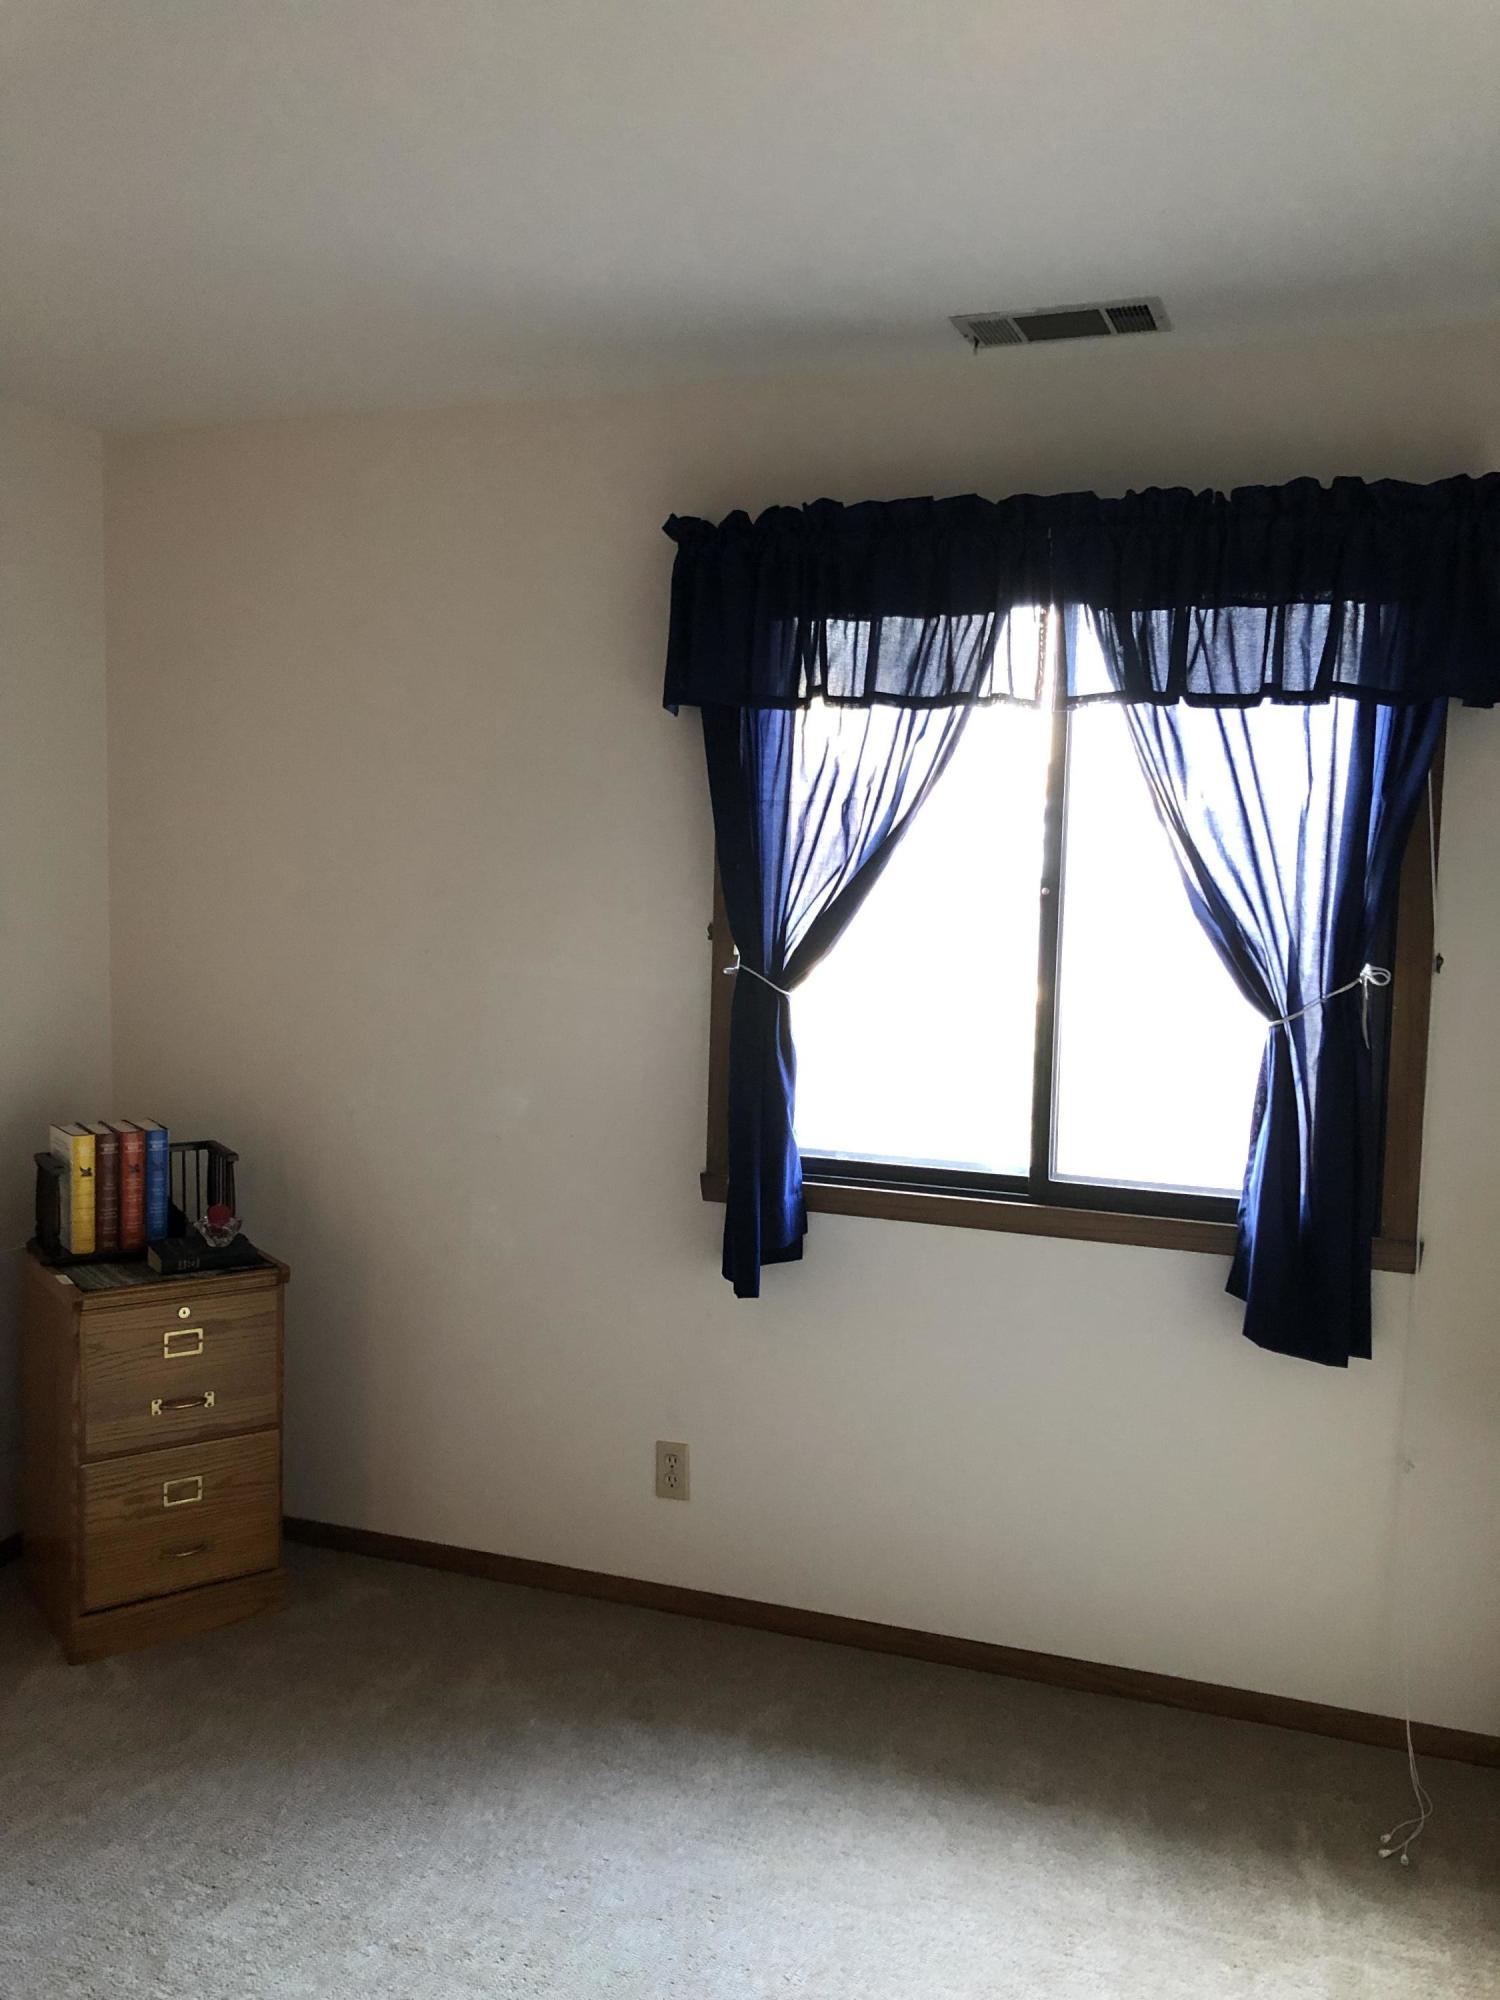 368 Park Hill Dr, Pewaukee, Wisconsin 53072, 2 Bedrooms Bedrooms, 5 Rooms Rooms,2 BathroomsBathrooms,Condominiums,For Sale,Park Hill Dr,1,1616339